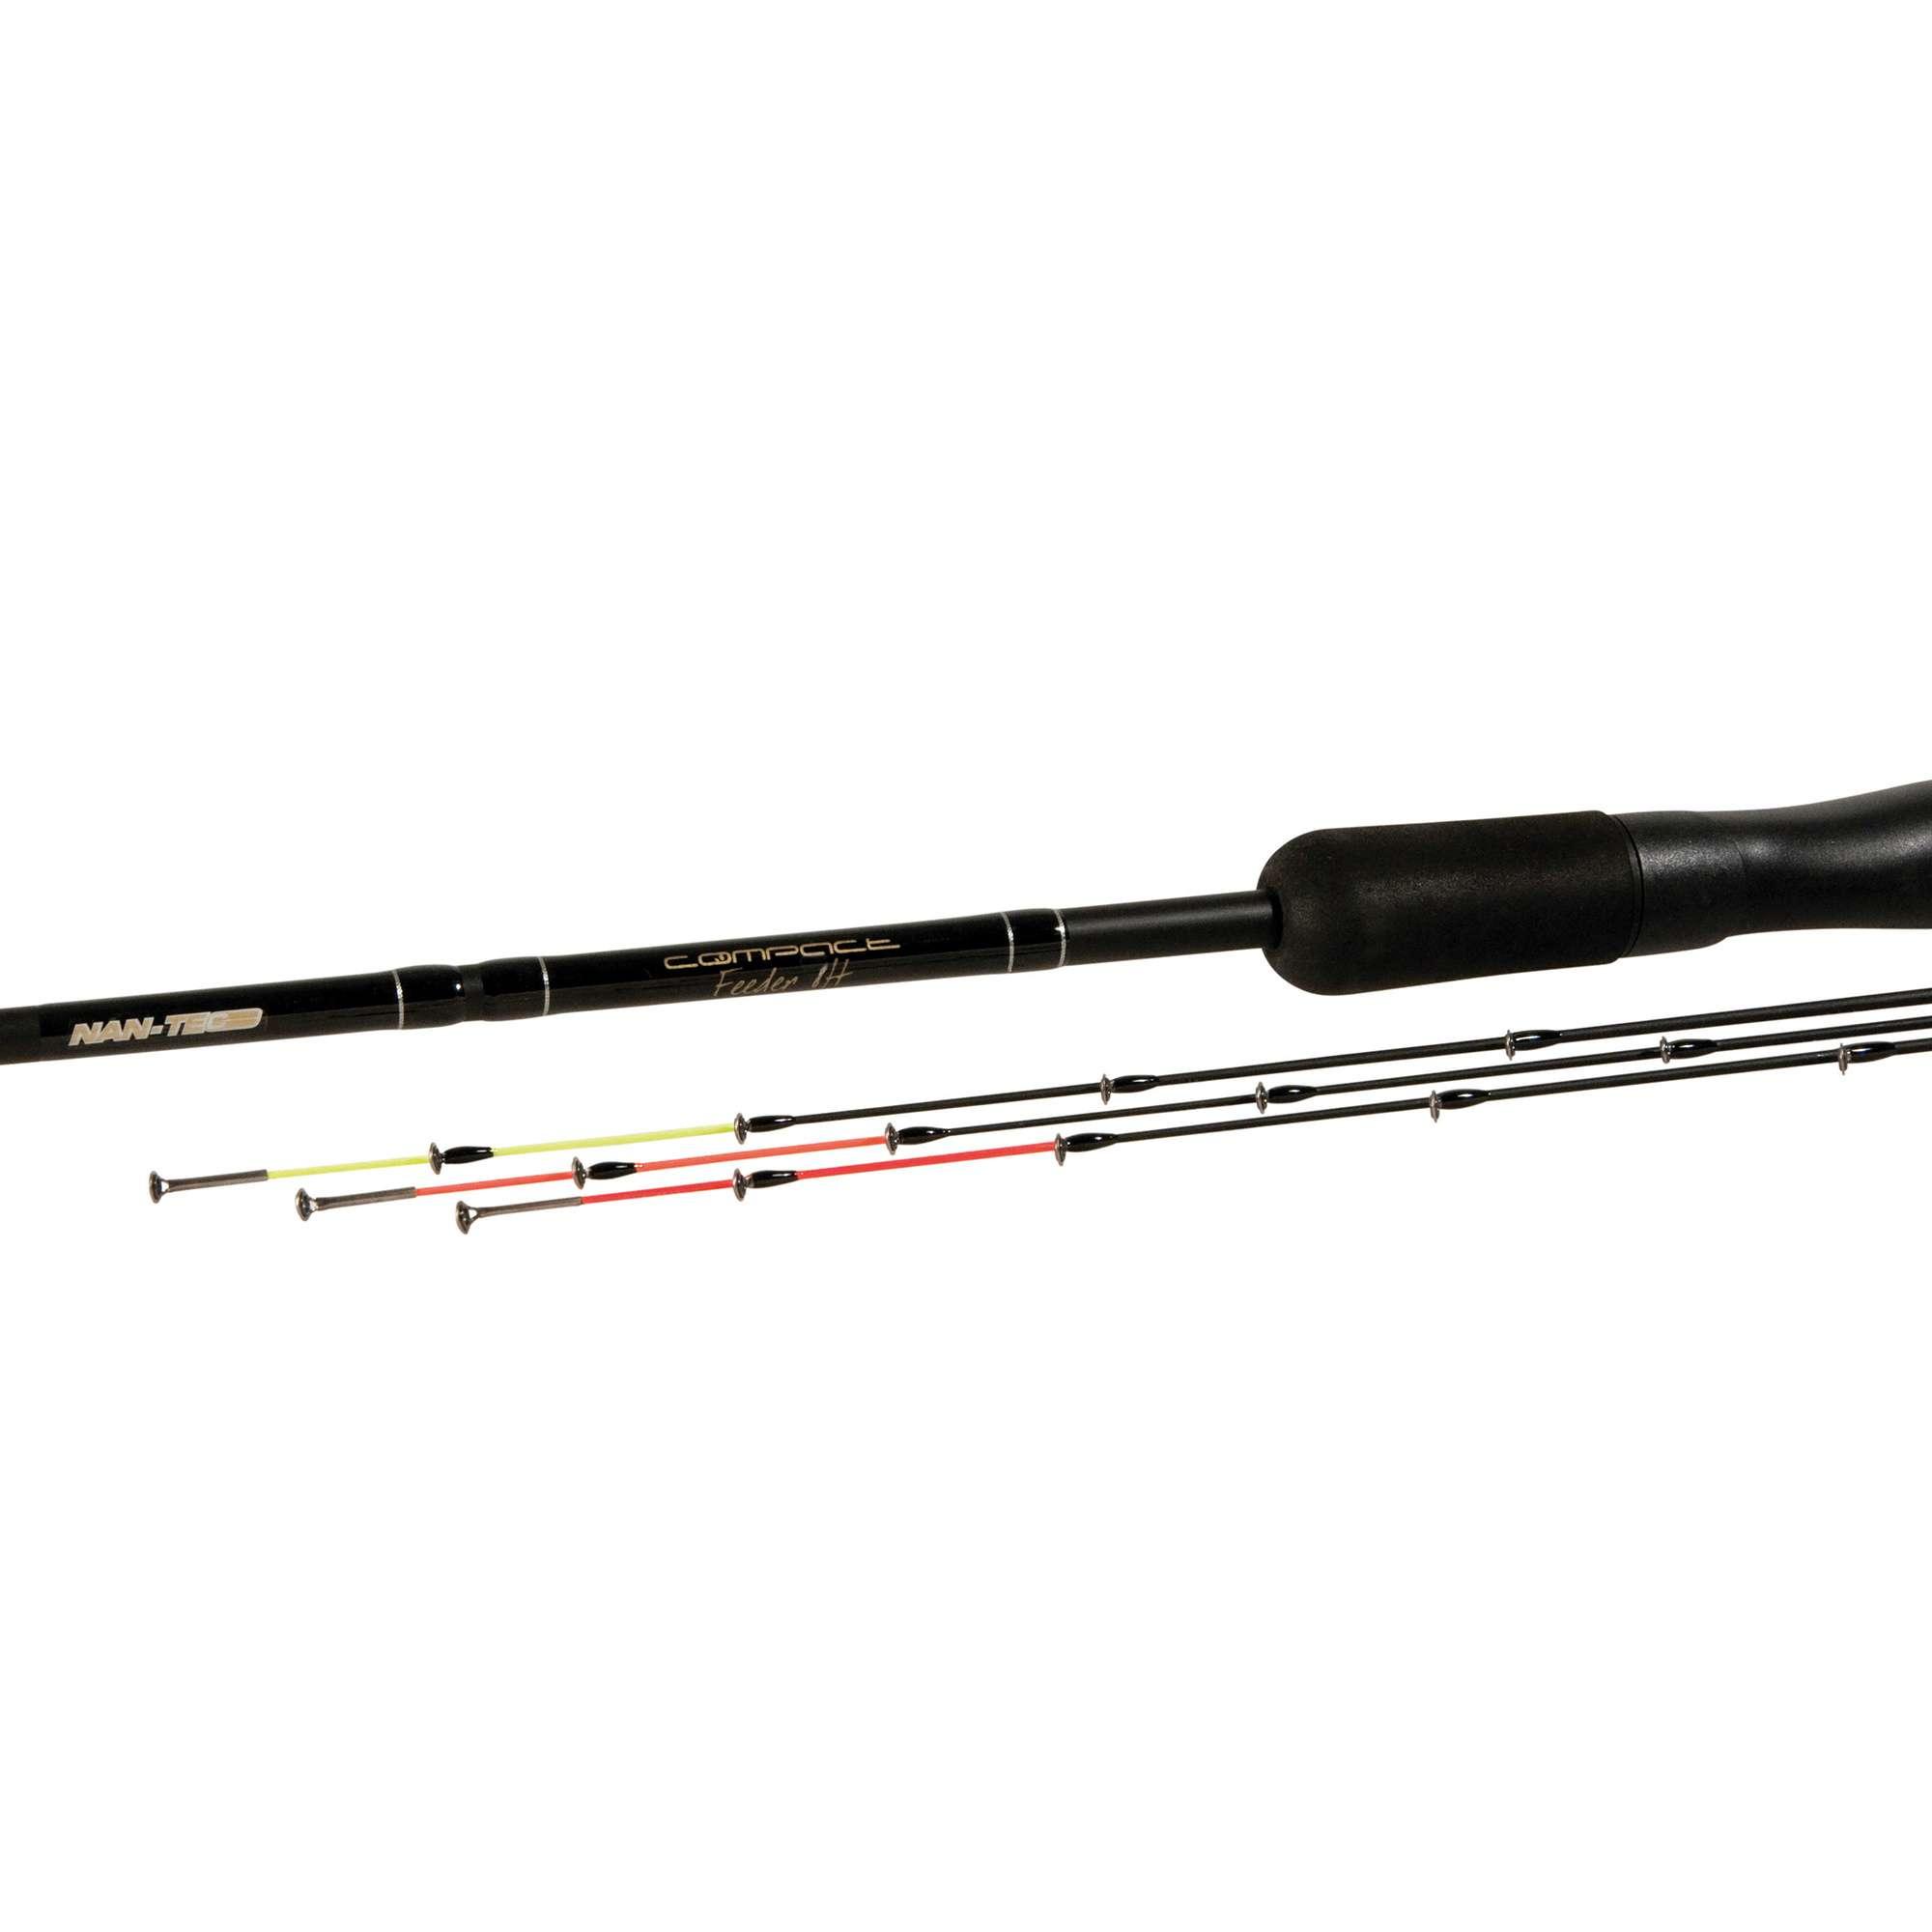 TFG 8' Compact Nan-Tec Feeder Rod